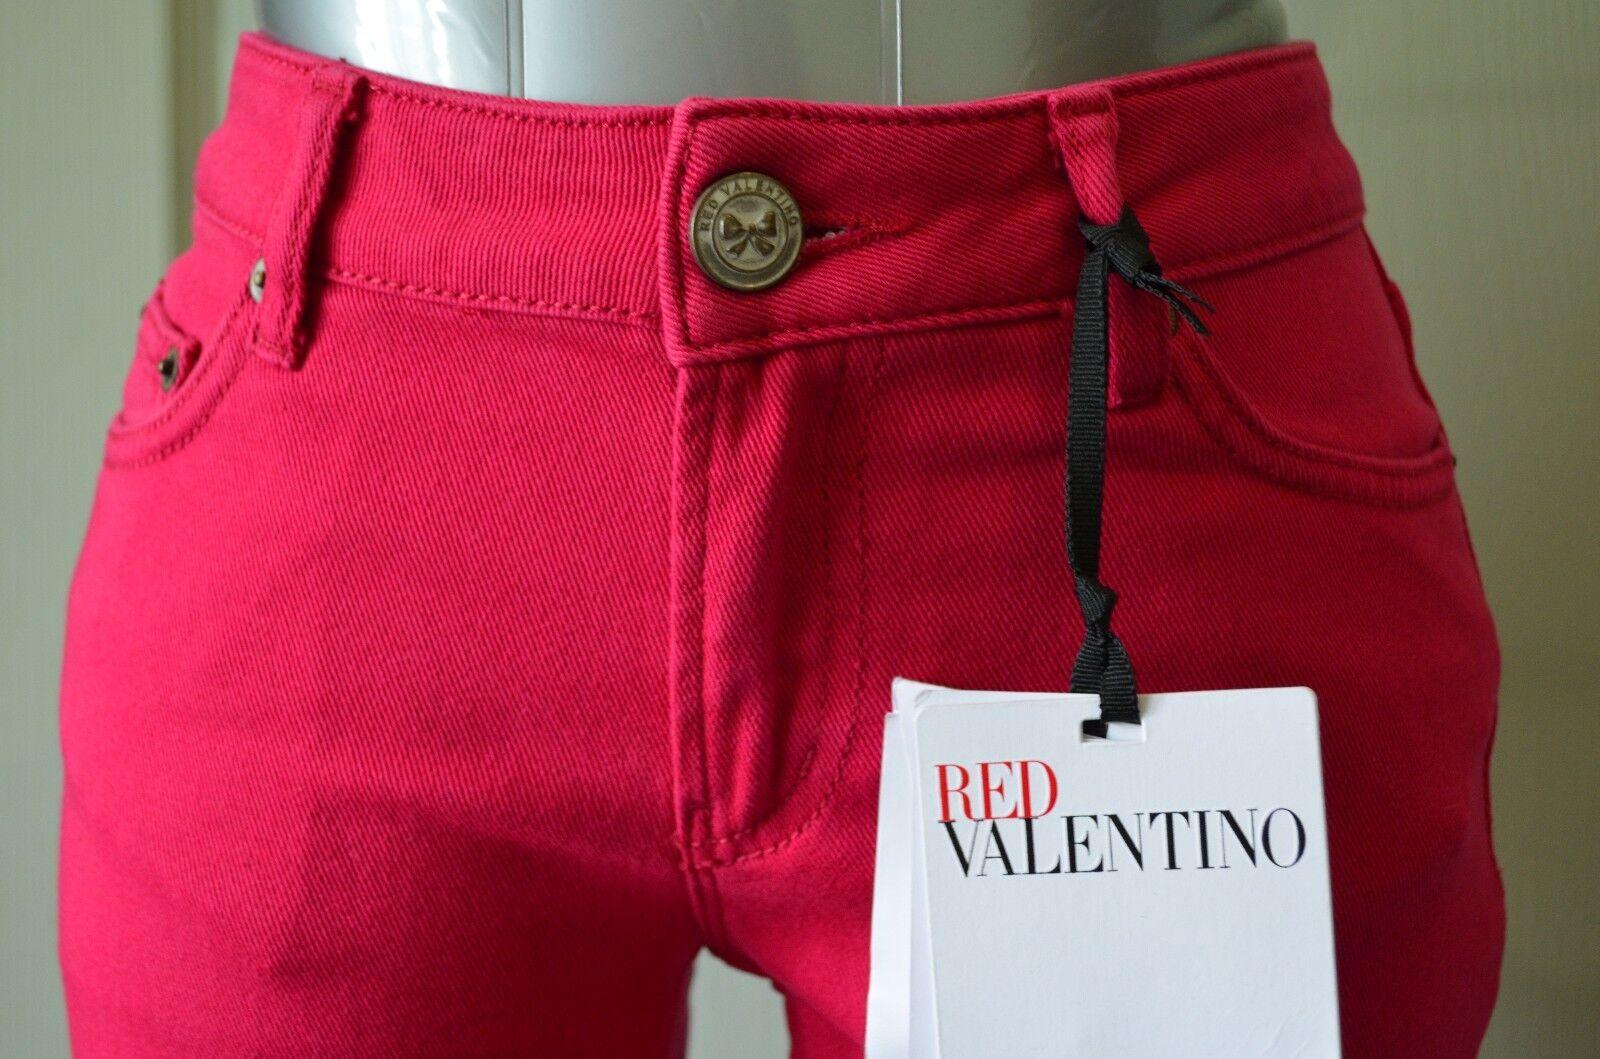 Neuf avec étiquettes rot Valentino Jeans 25 W SUPER MIGNON PANTALON SLIM Magenta Bow Designer XS